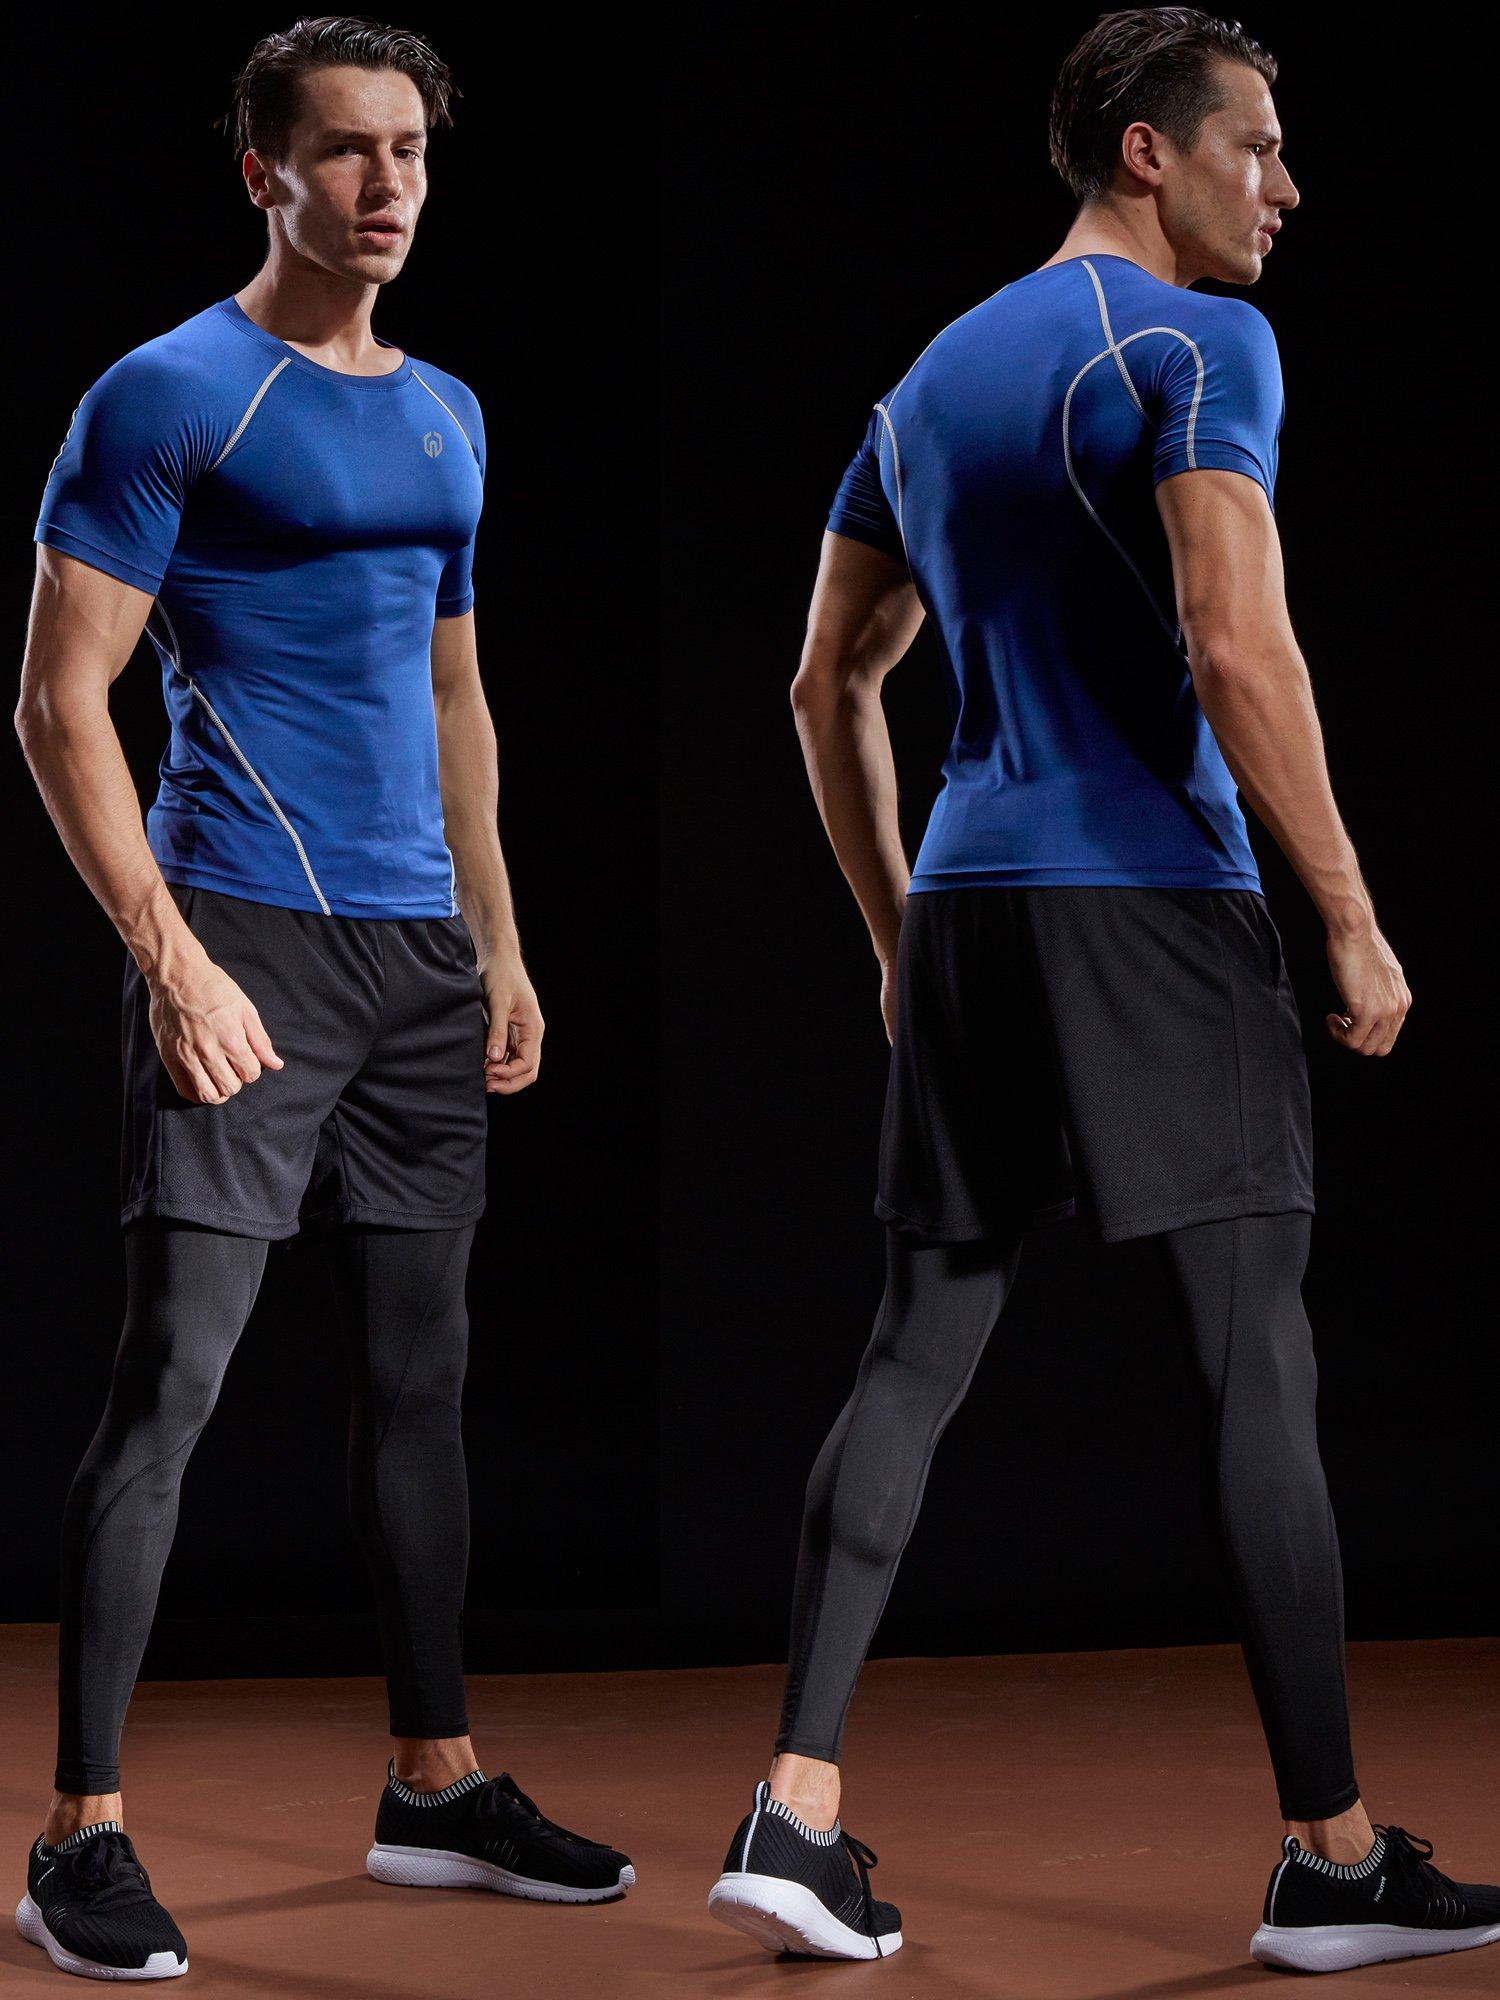 Neleus Men's 3 Pack Compression Baselayer Athletic Workout T Shirts,5022,Black,Grey,Red,S,EU M by Neleus (Image #5)